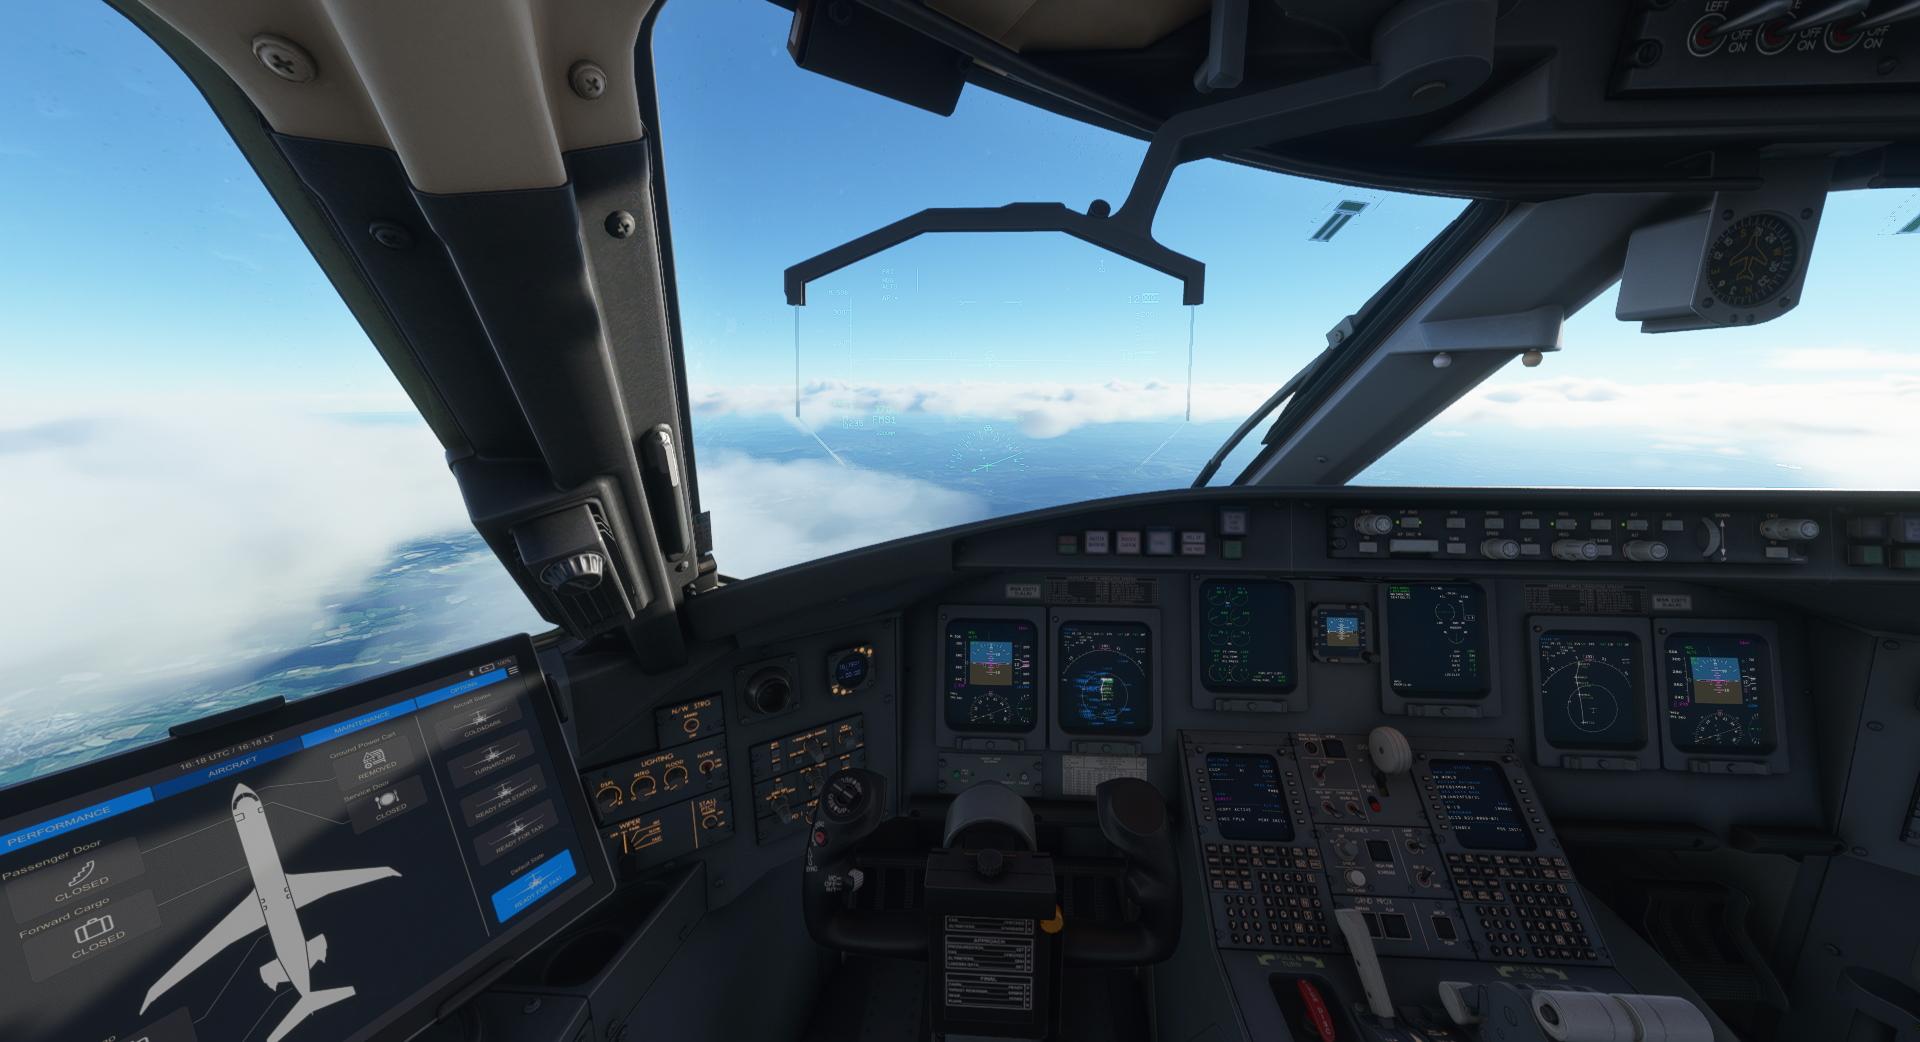 Microsoft Flight Simulator Aerosoft Crj 550 700 Flightdeck